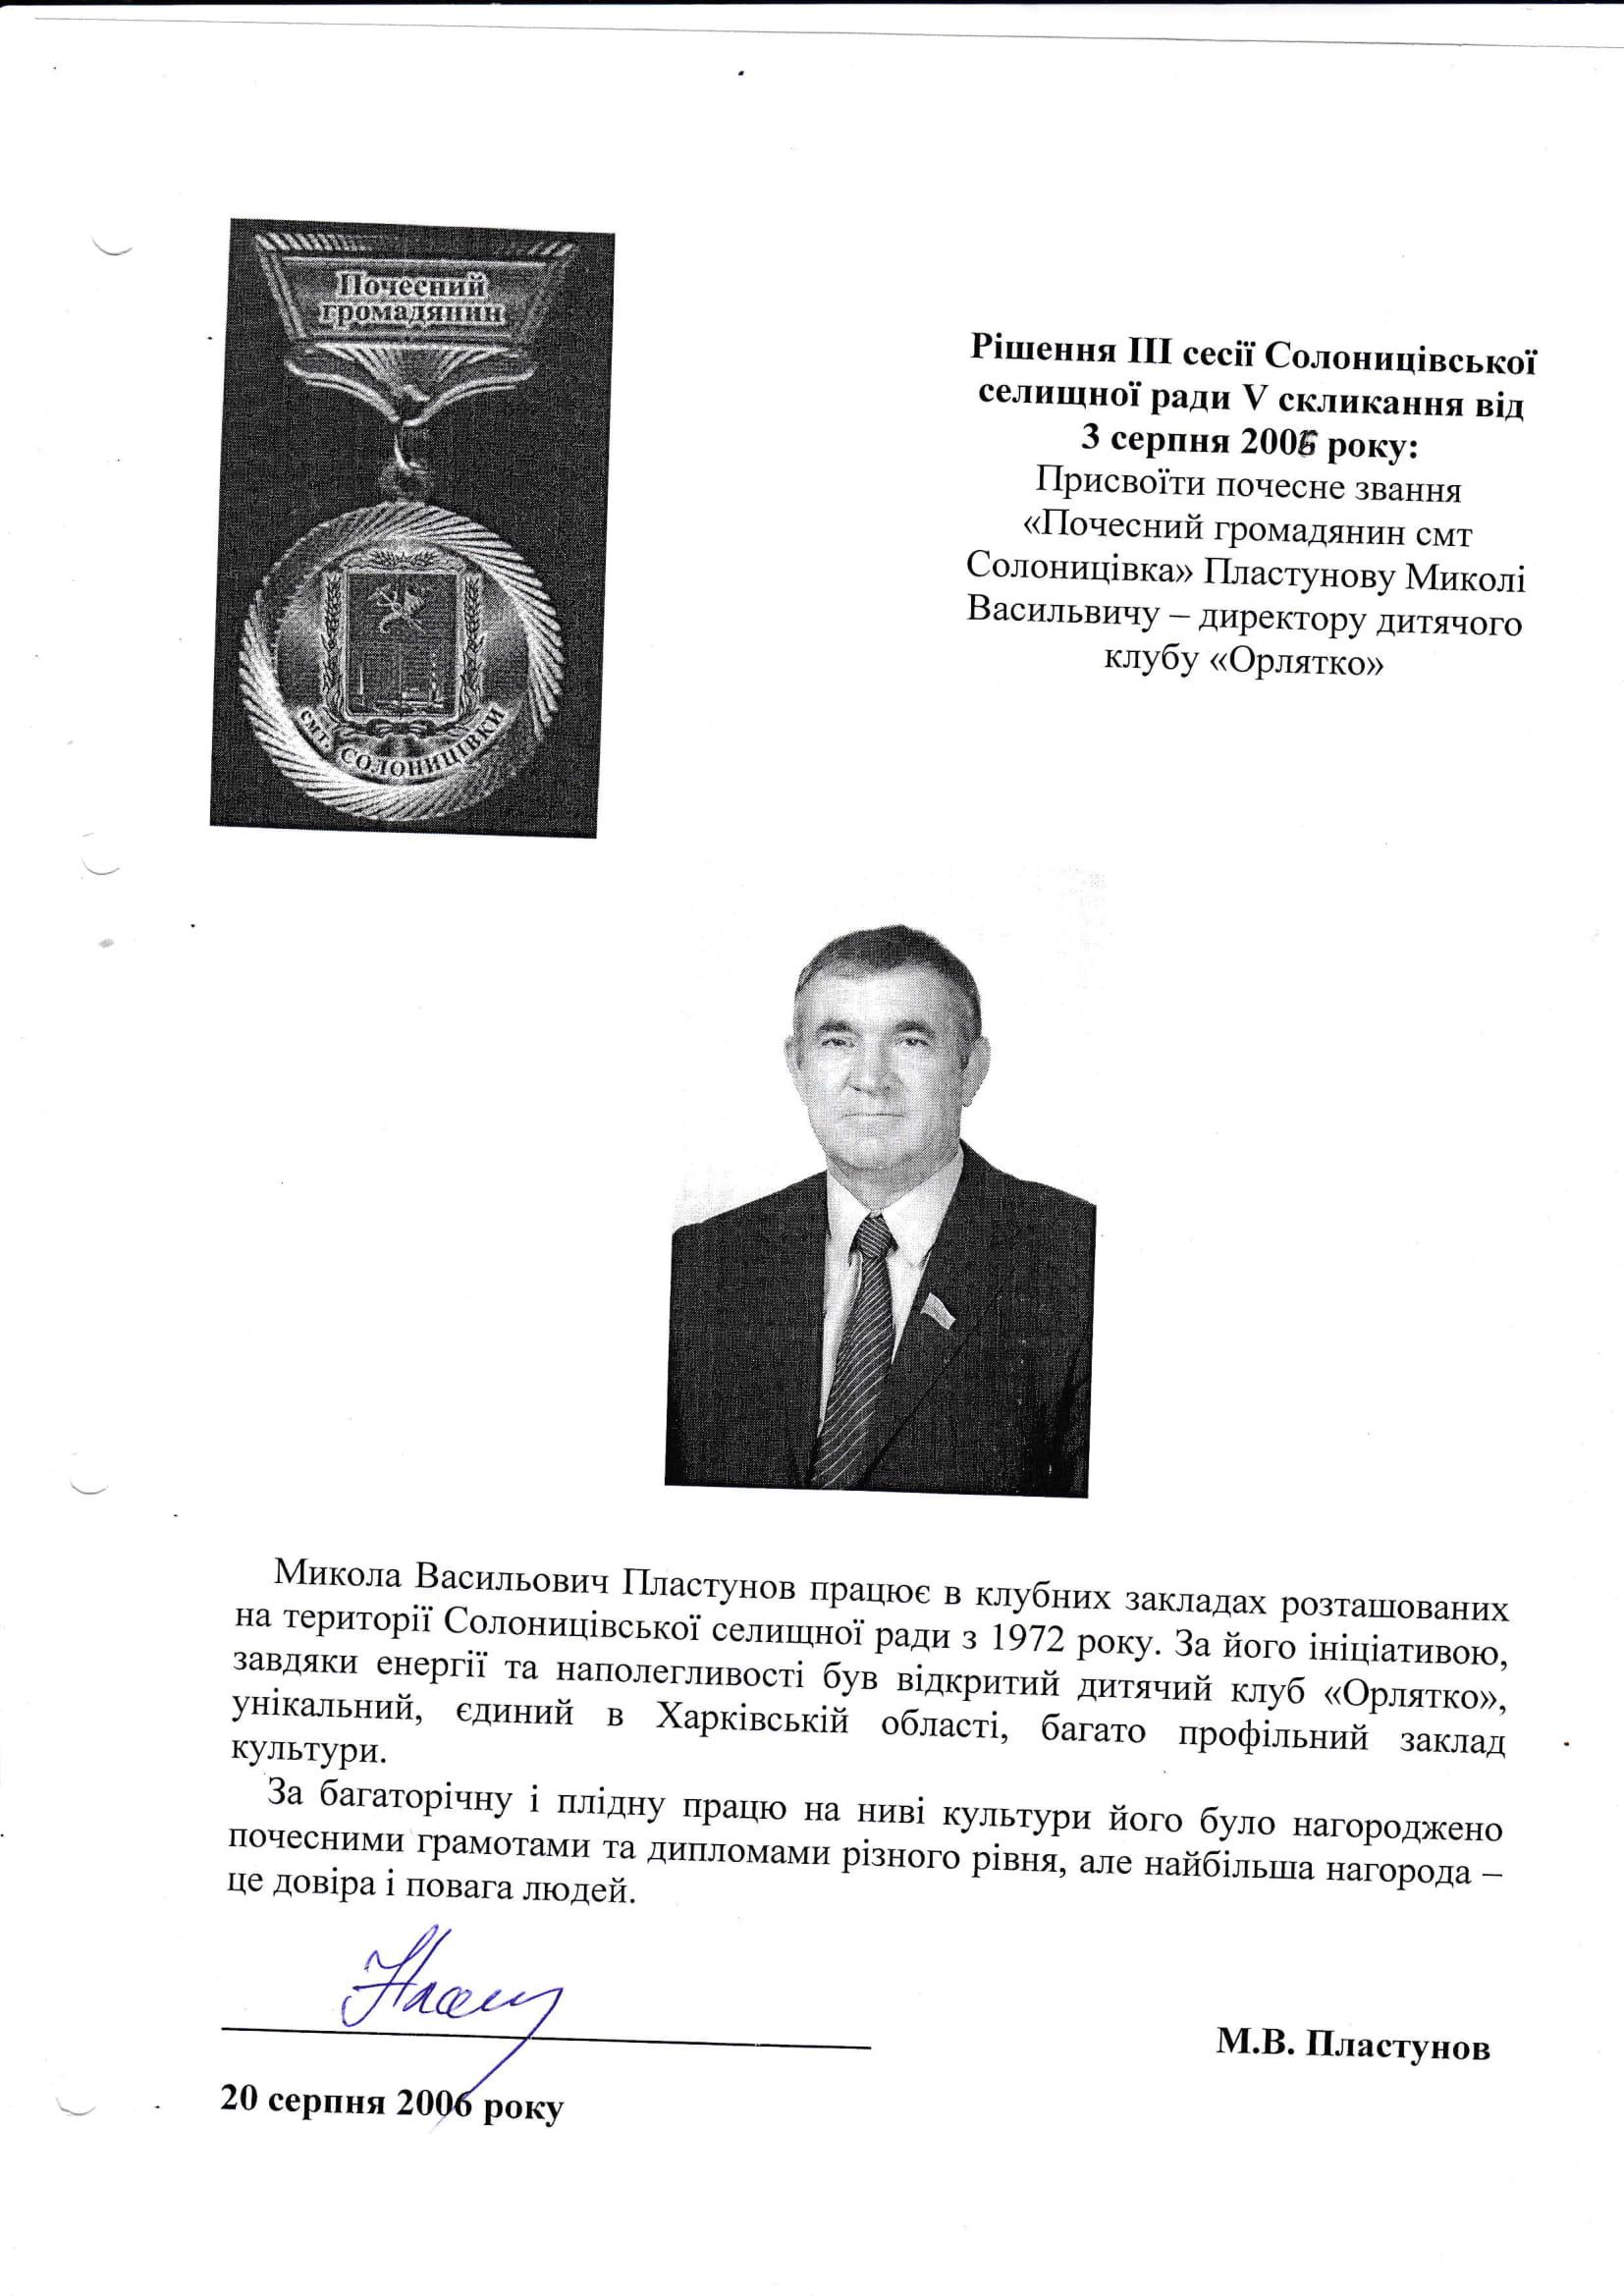 Пластунов Микола Васильович